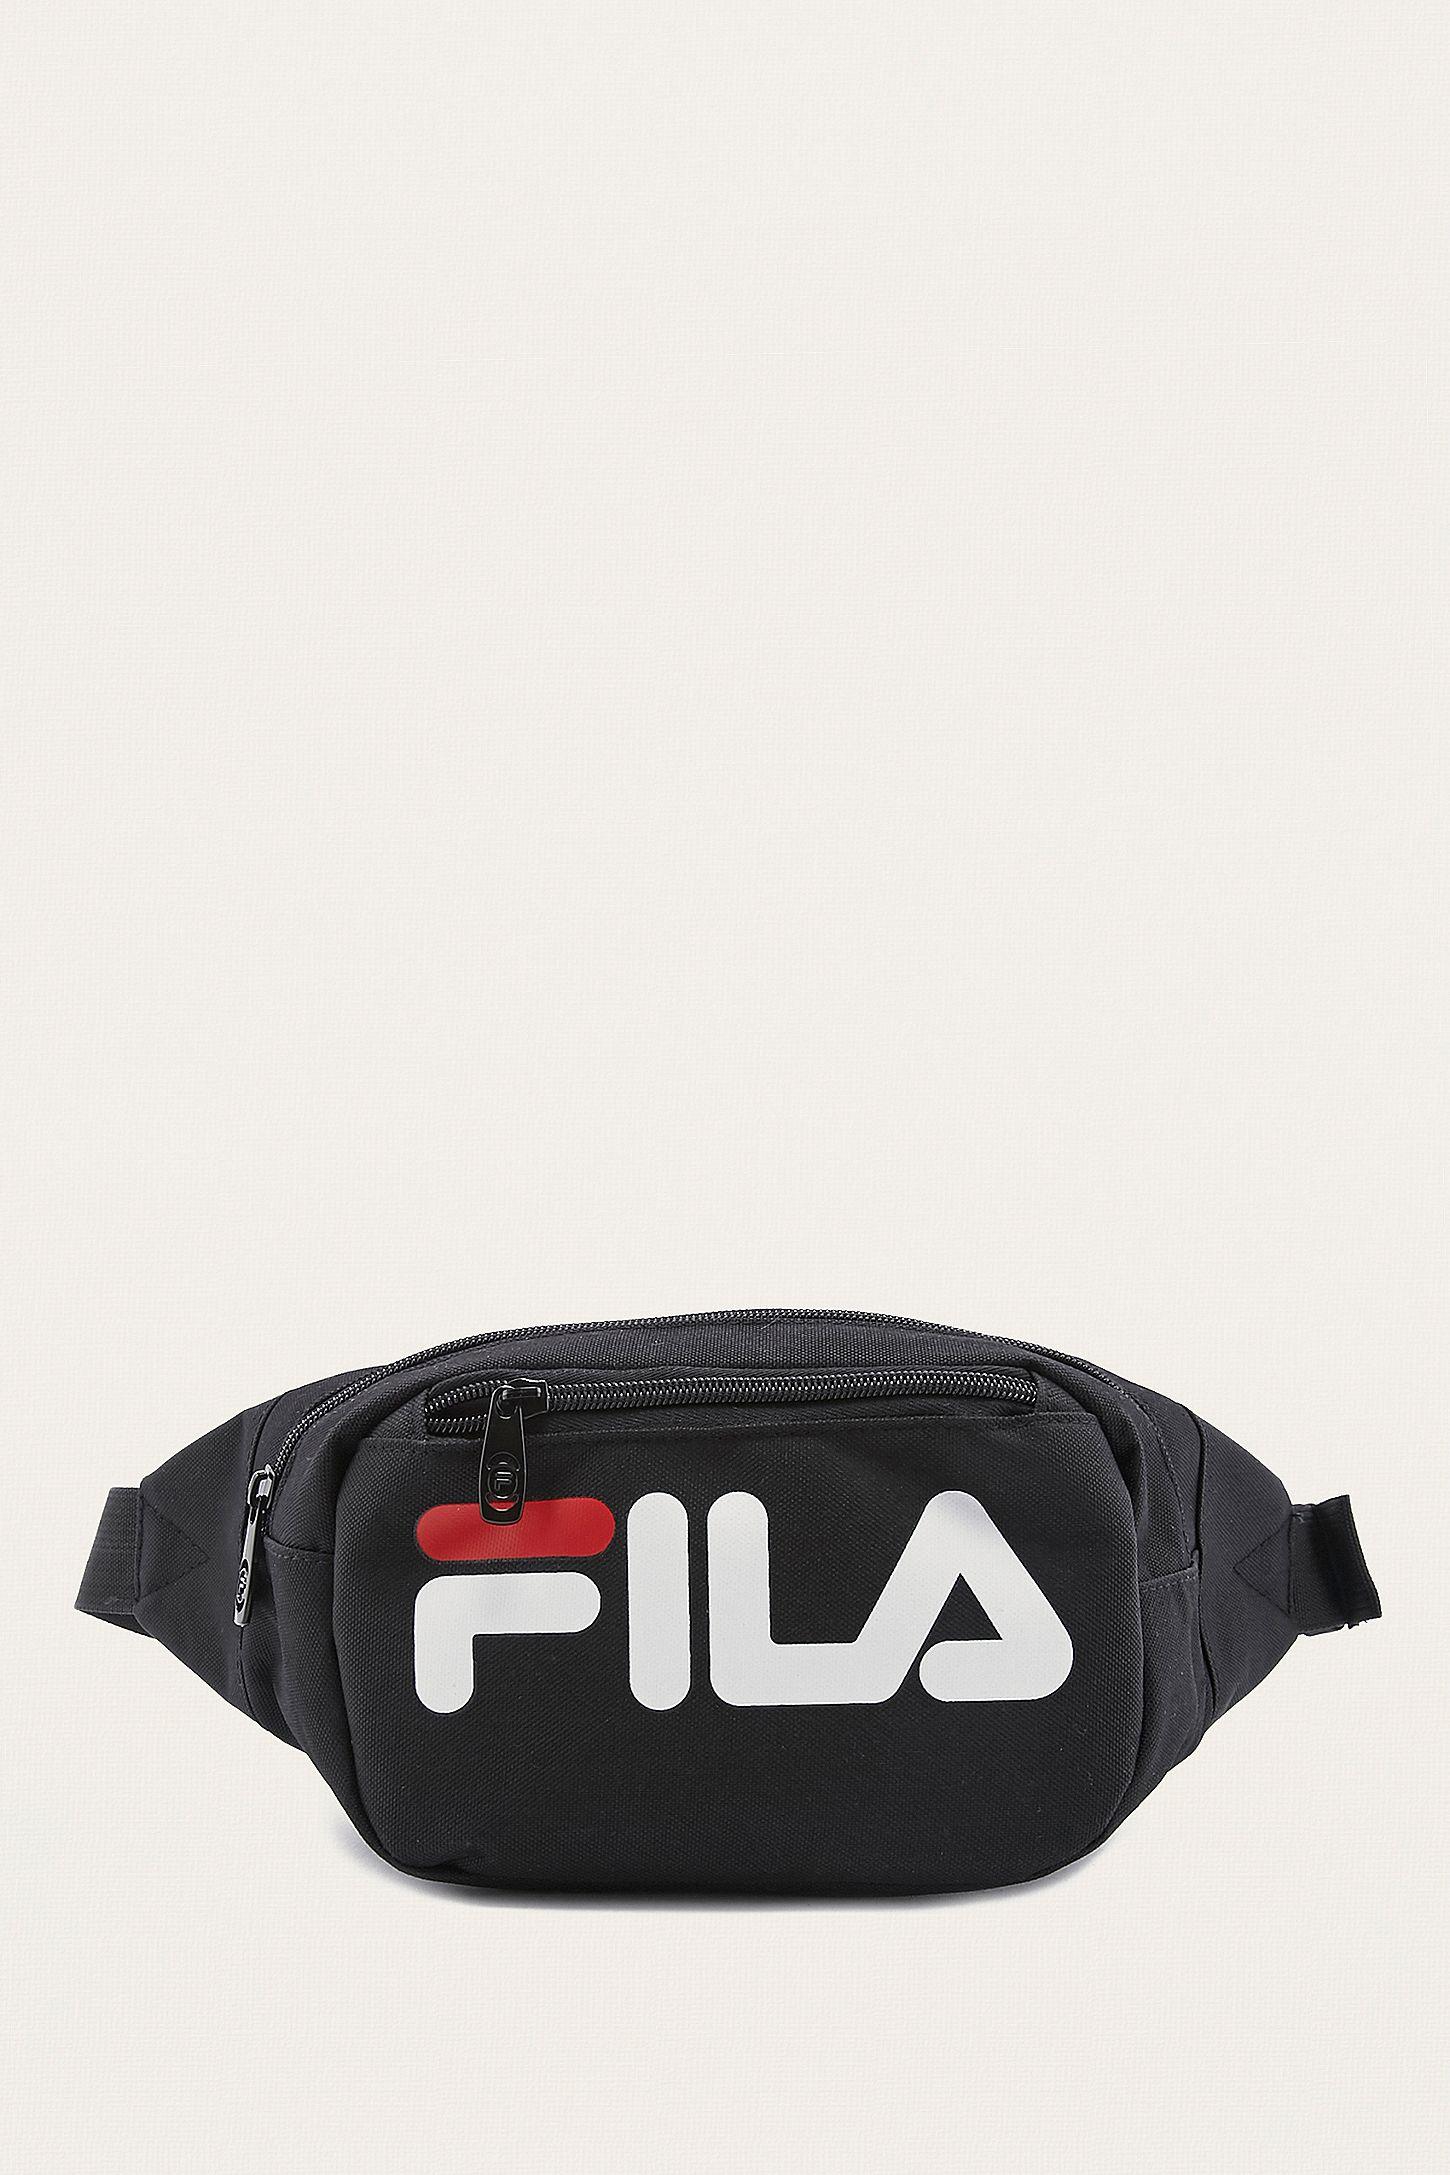 2f7d900562 FILA Adams Peacoat Courier Cross Body Bag